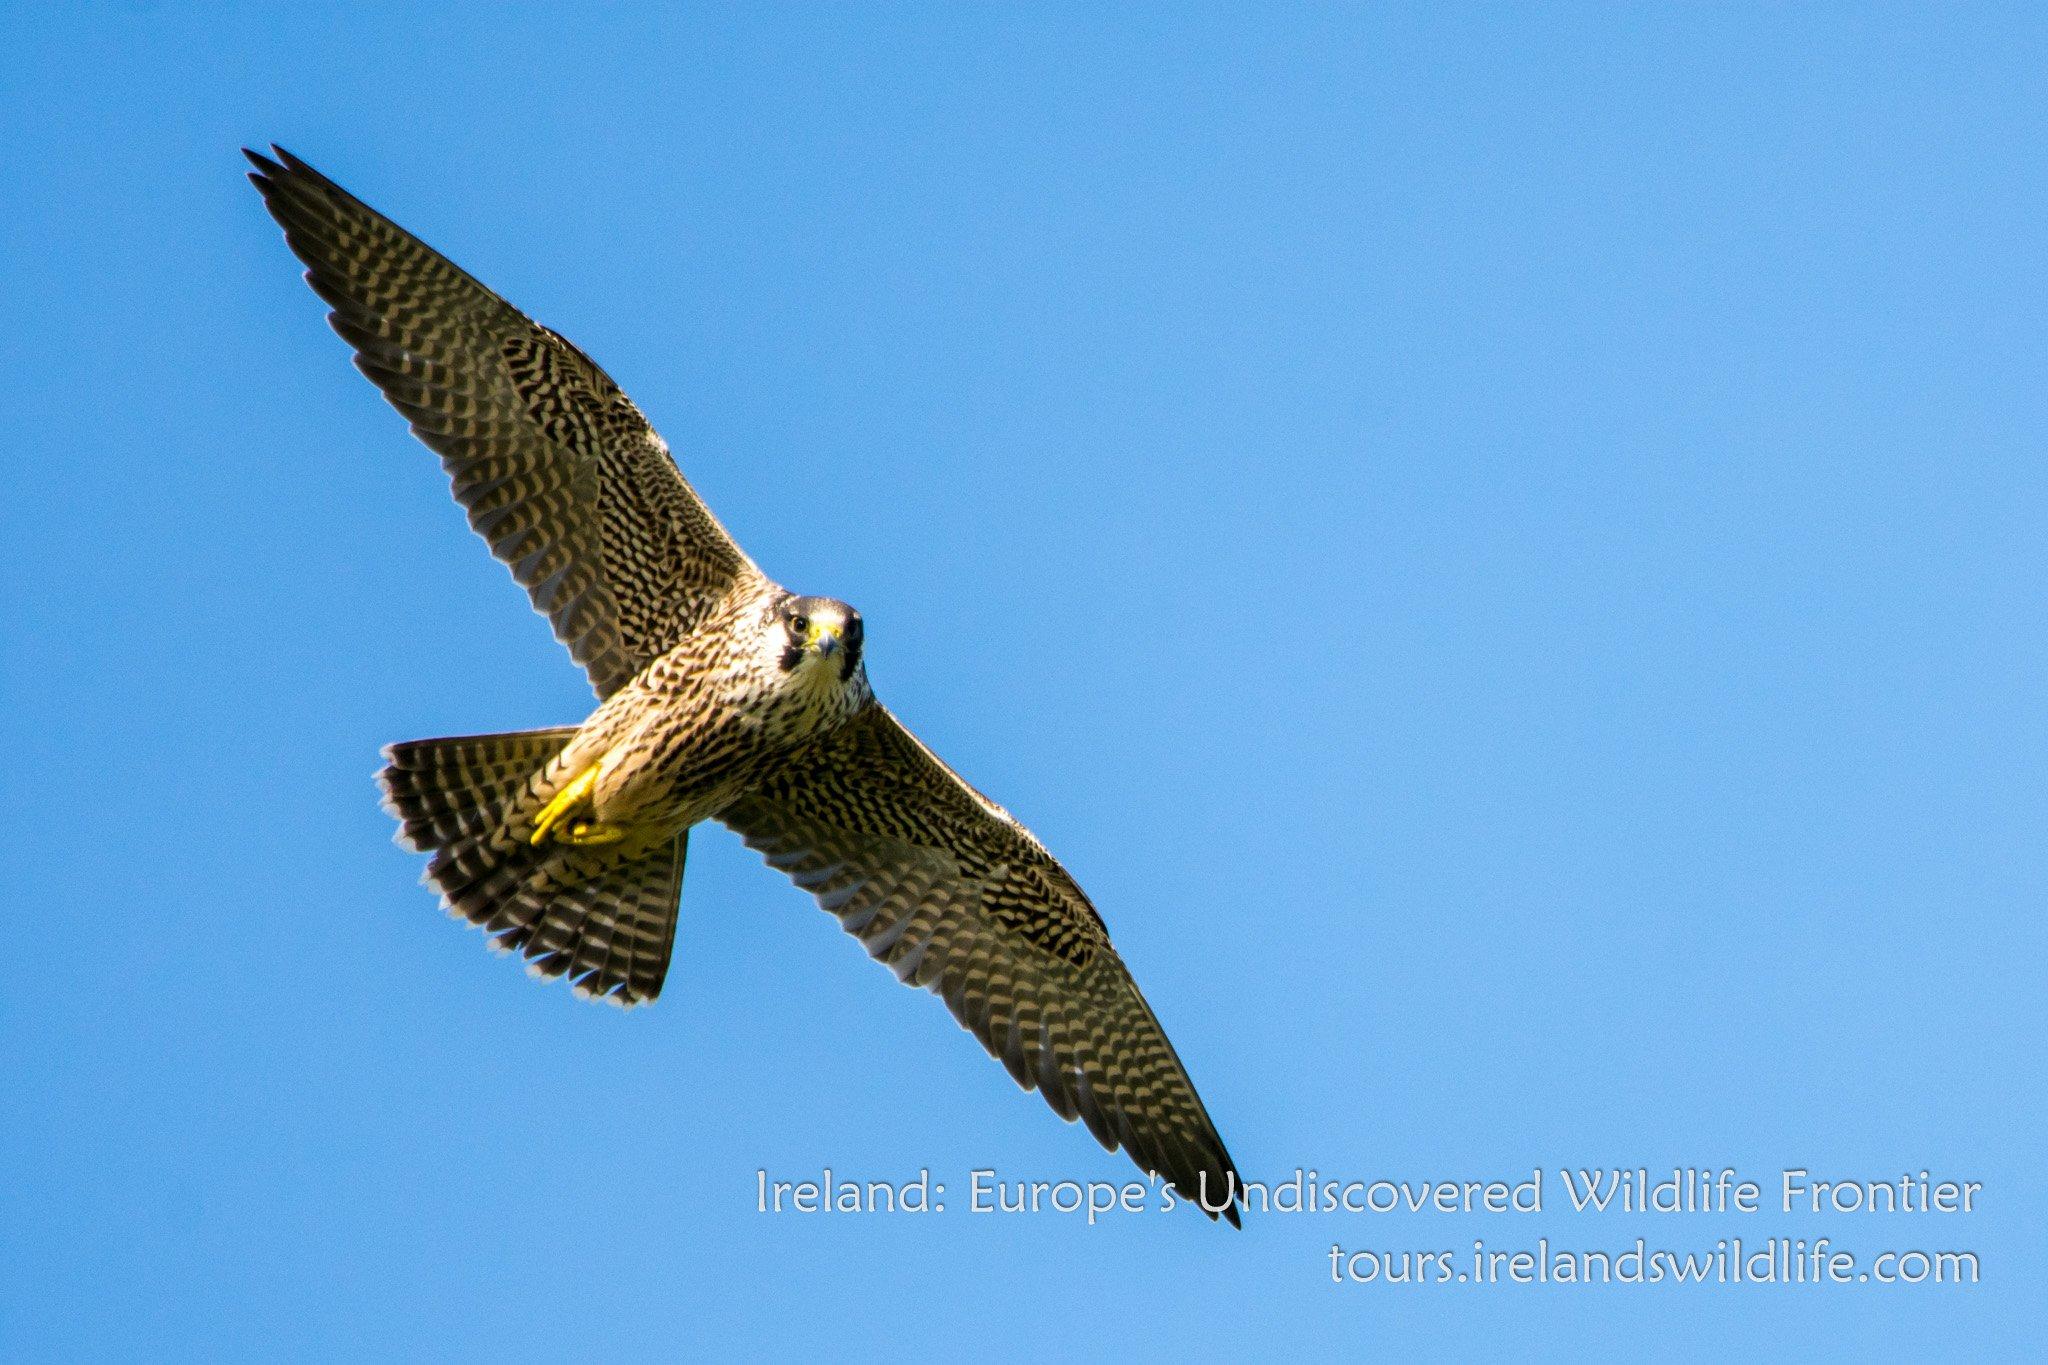 See Peregrine Falcon, the fastest bird on earth, on an Irish wildlife holiday on the Wild Atlantic Way